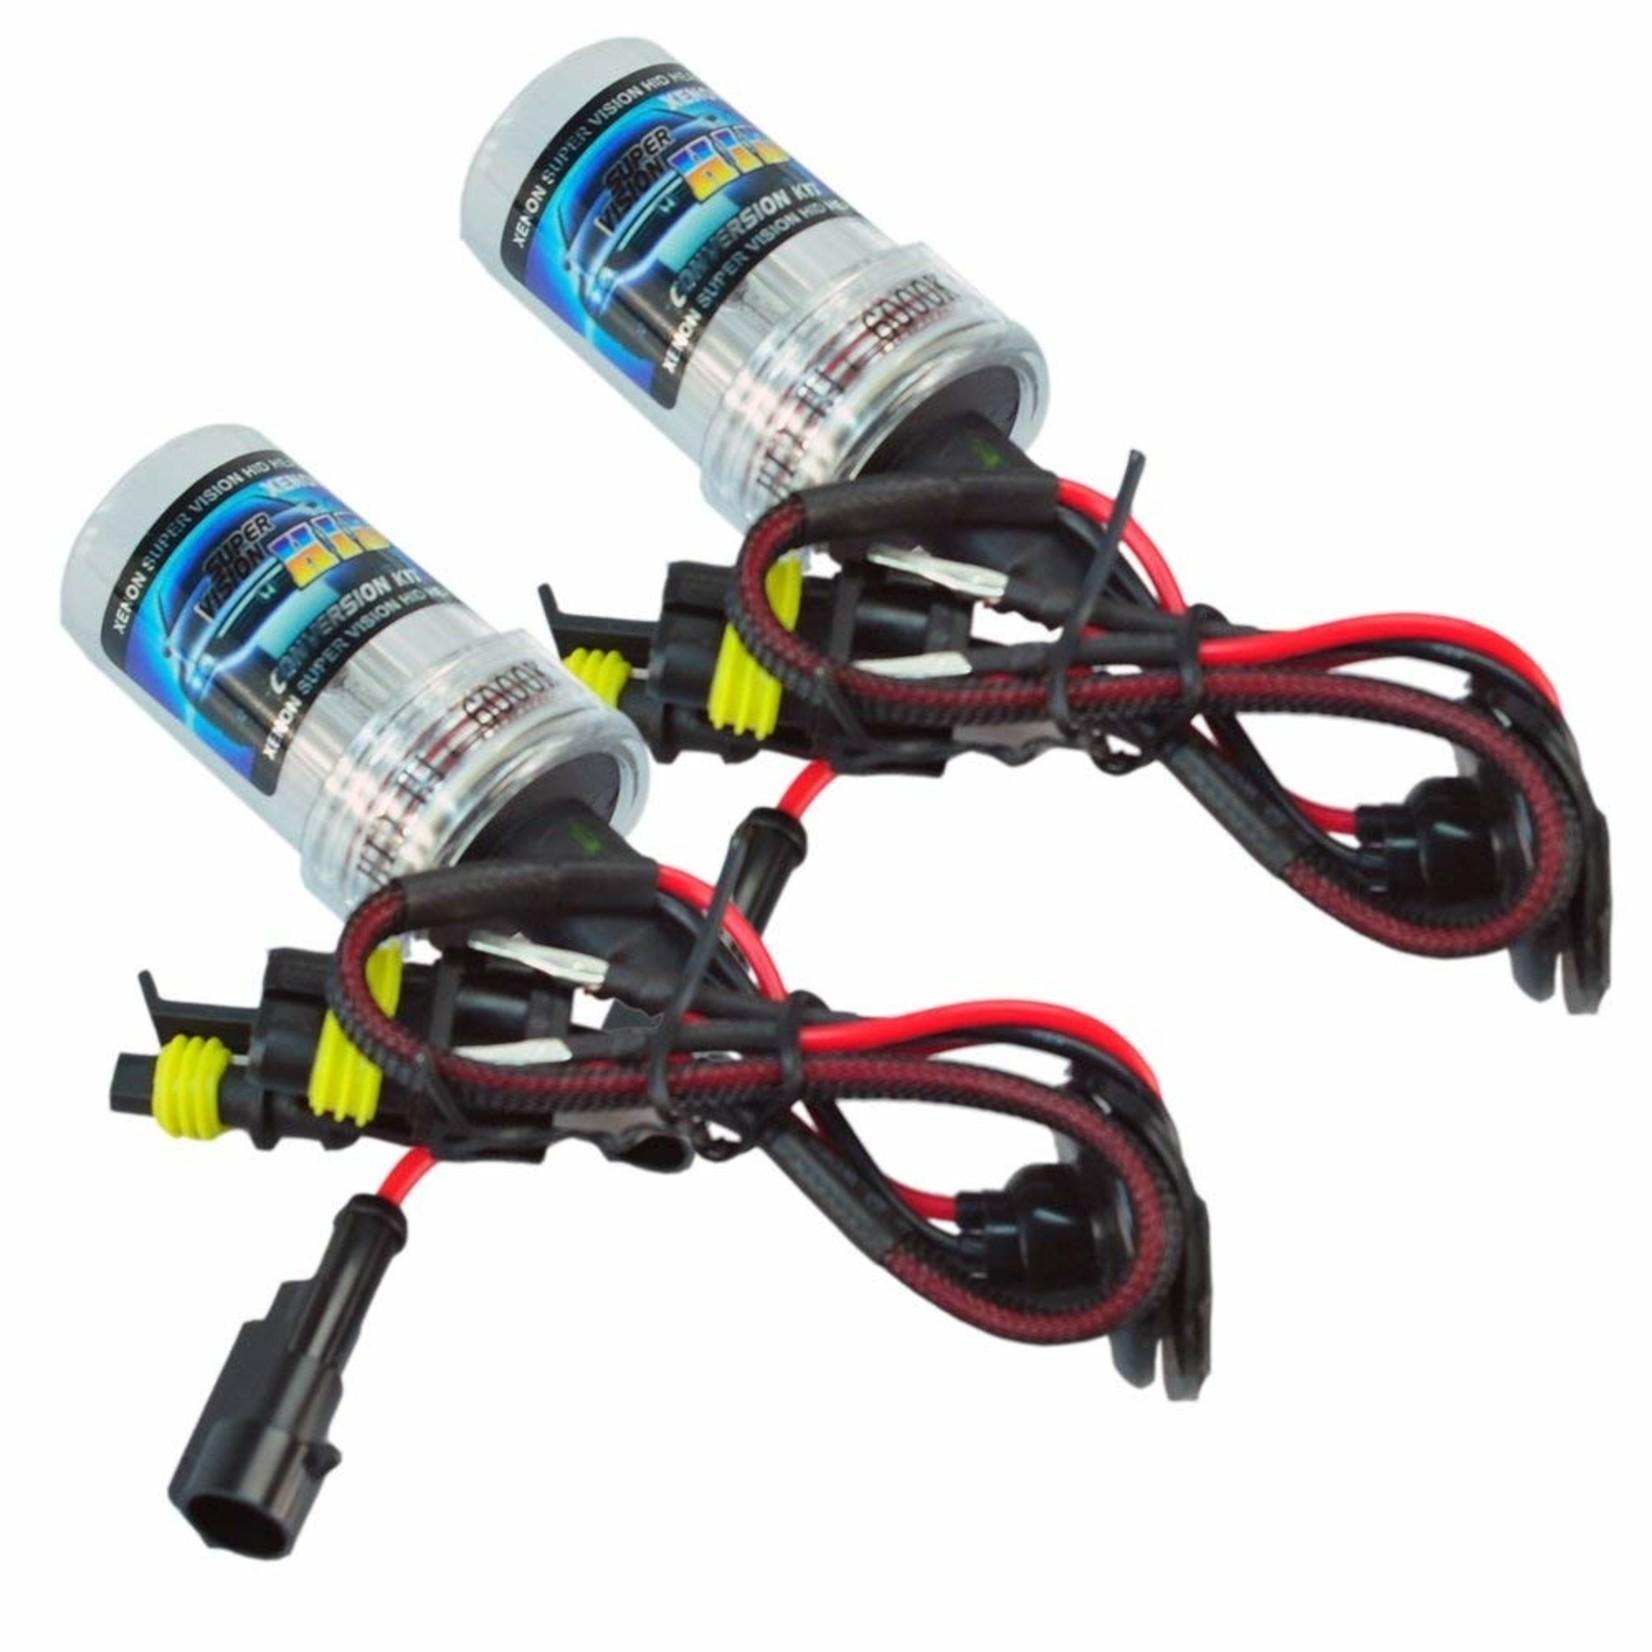 XEOD H8 Xenon vervangingslamp